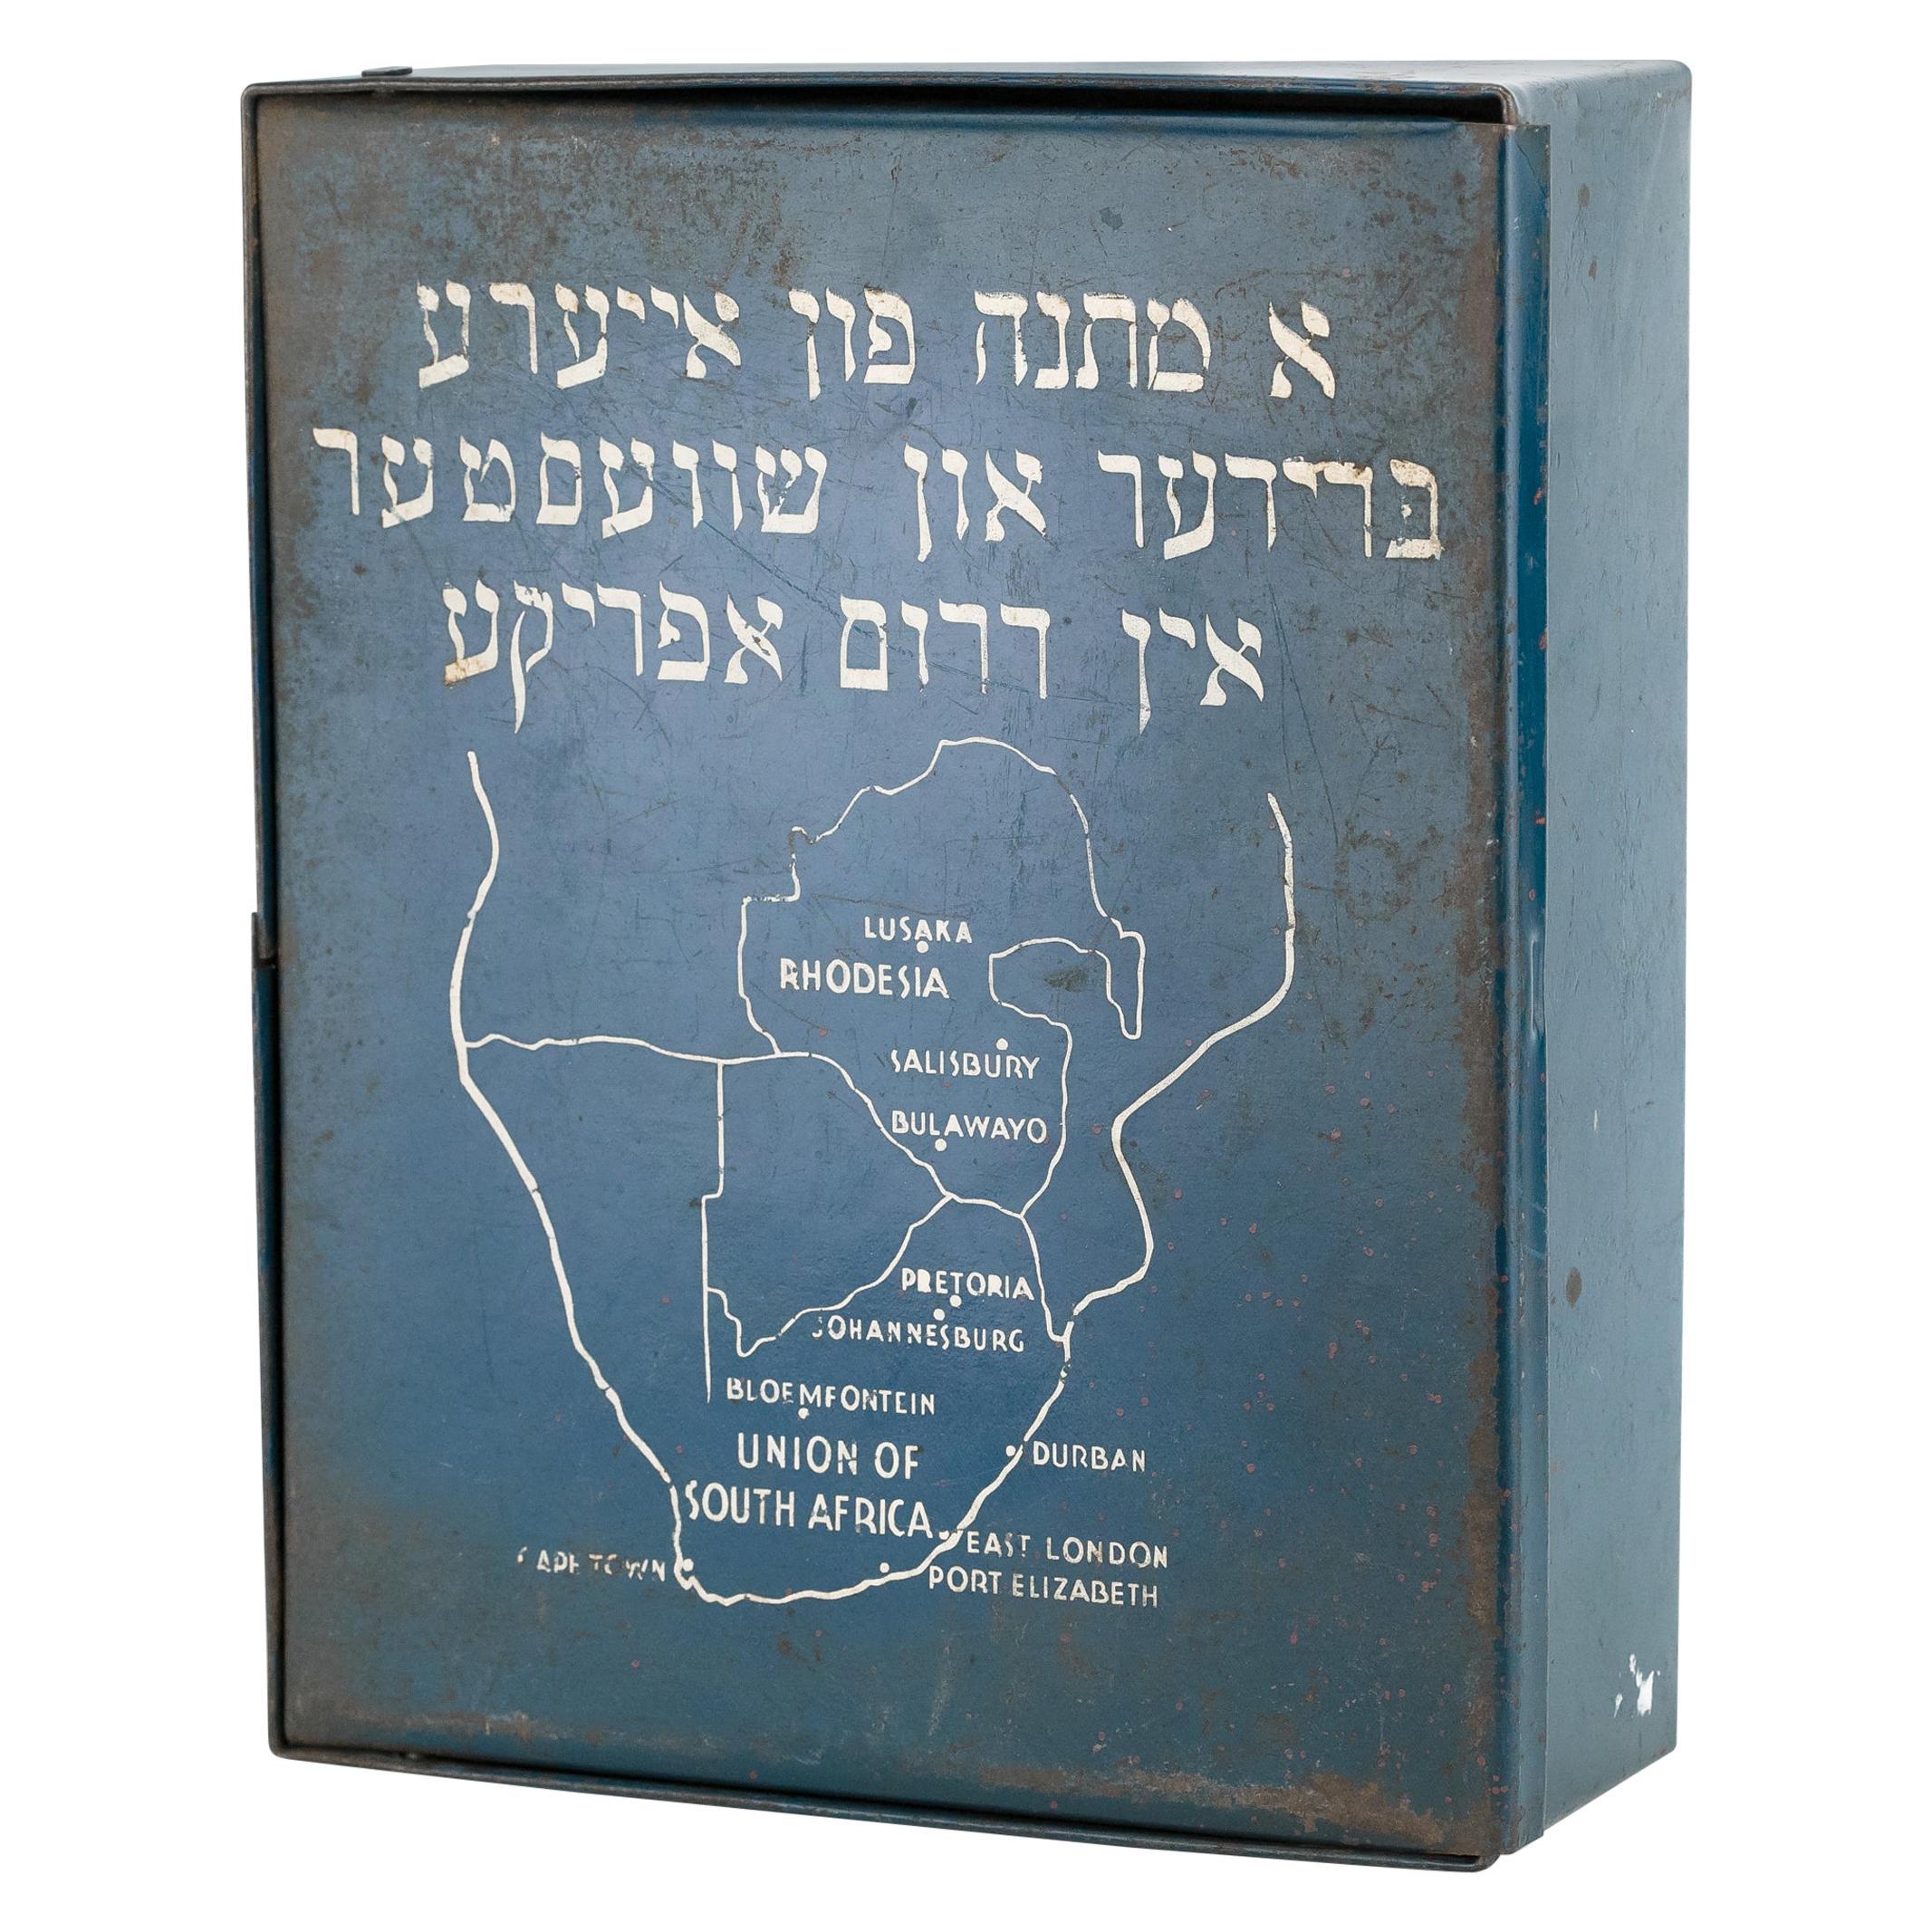 Post World War II South African Hebrew Inscribed Metal School Supply Box